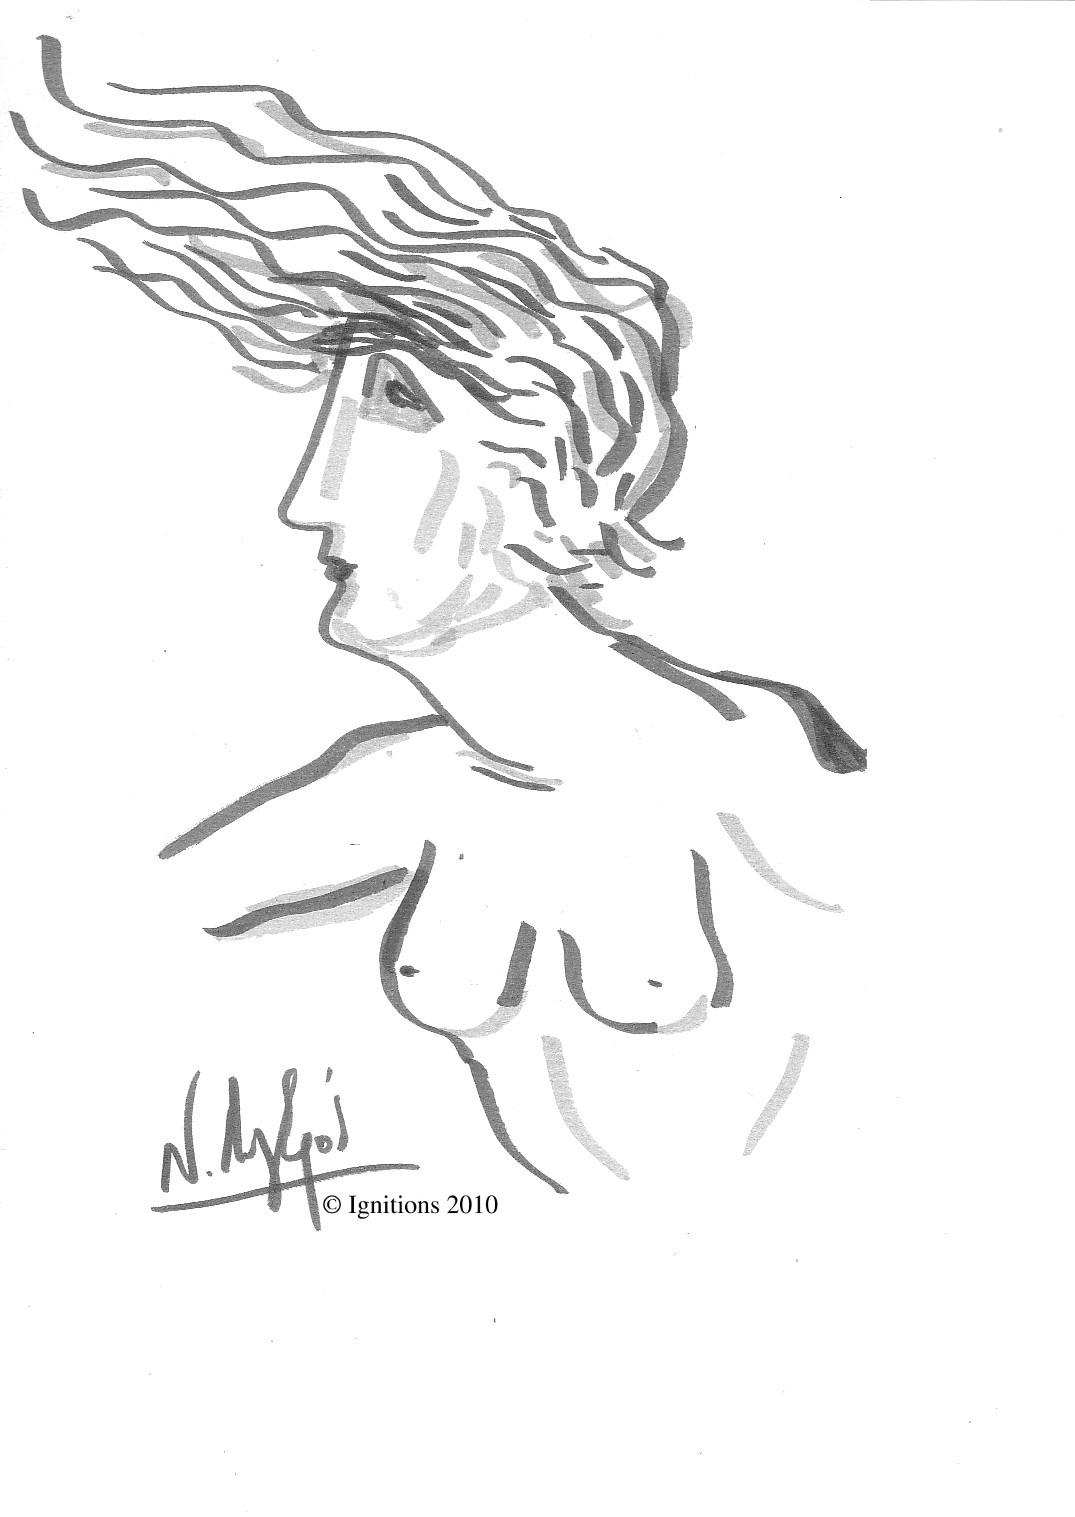 Représentation allégorique féminine de Leonardo da Vinci.